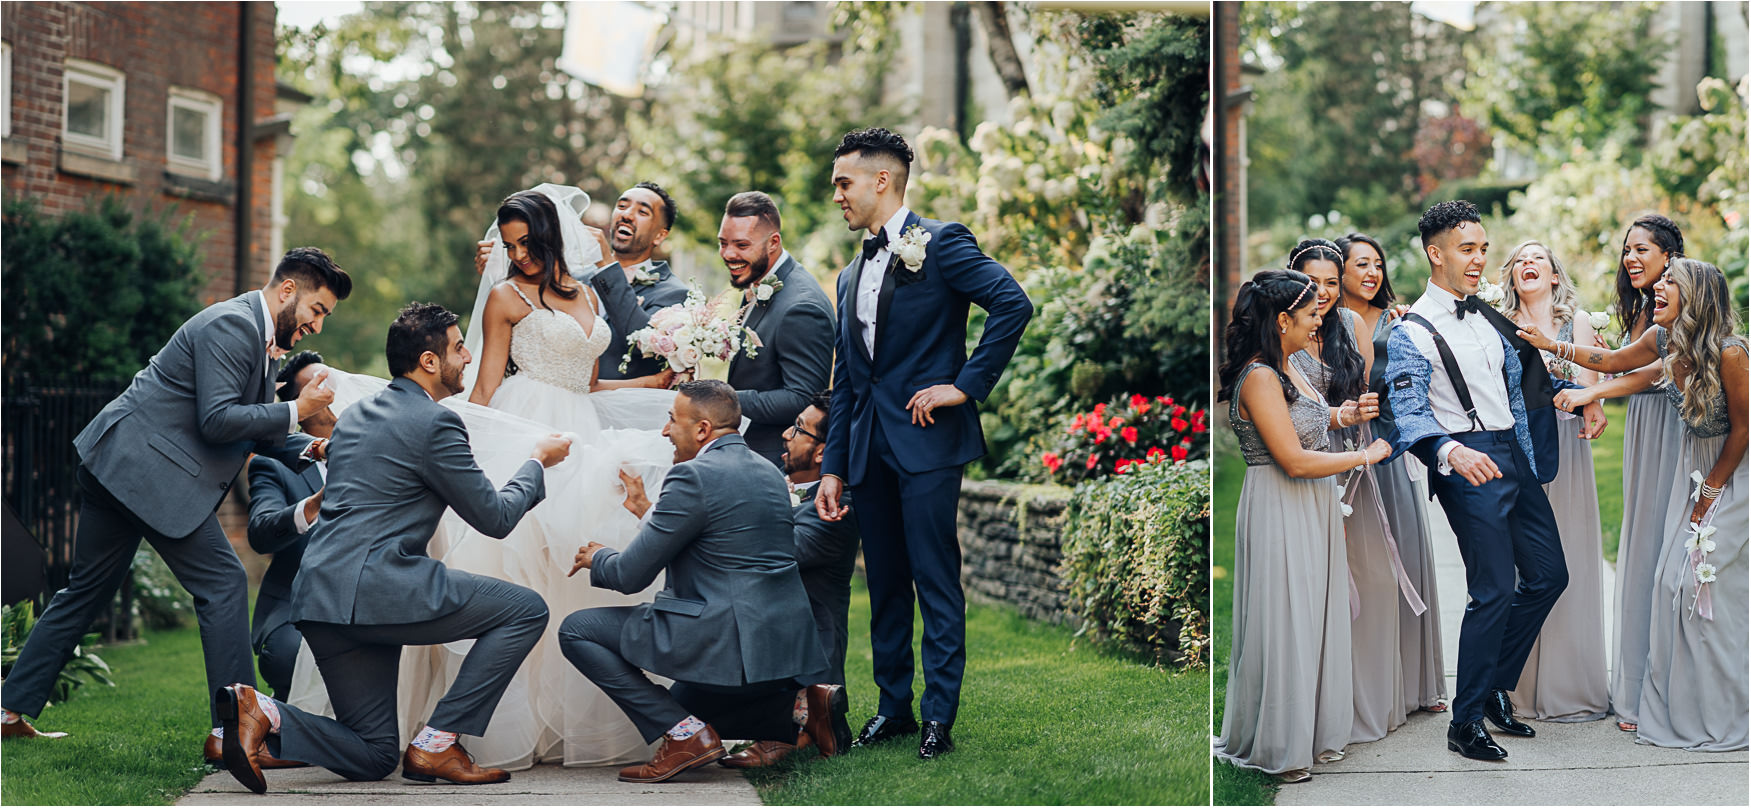 Toronto Victoria University Wedding Party Photo